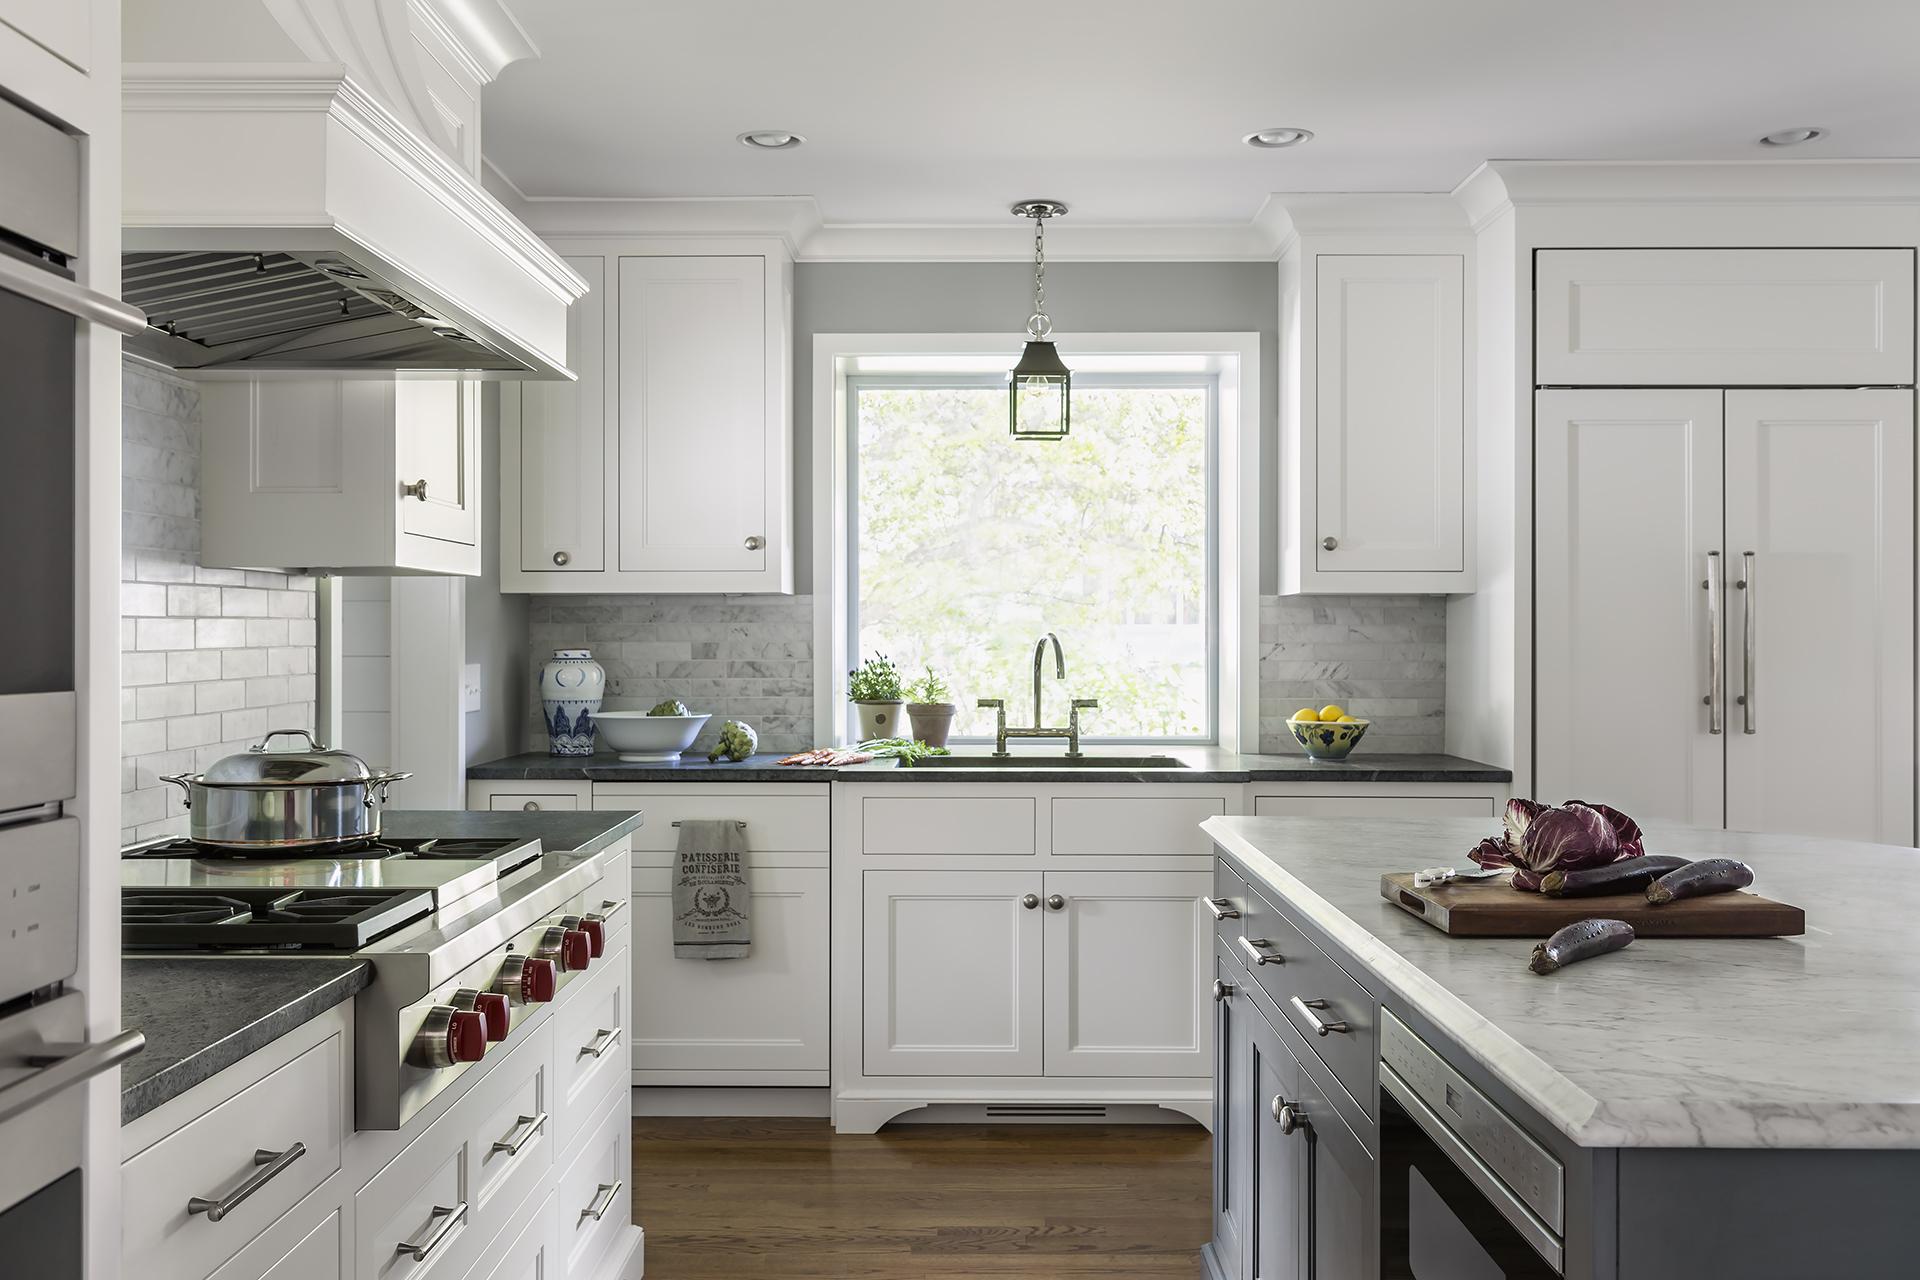 Kitchen_Stove_Window_2016_05_05.jpg